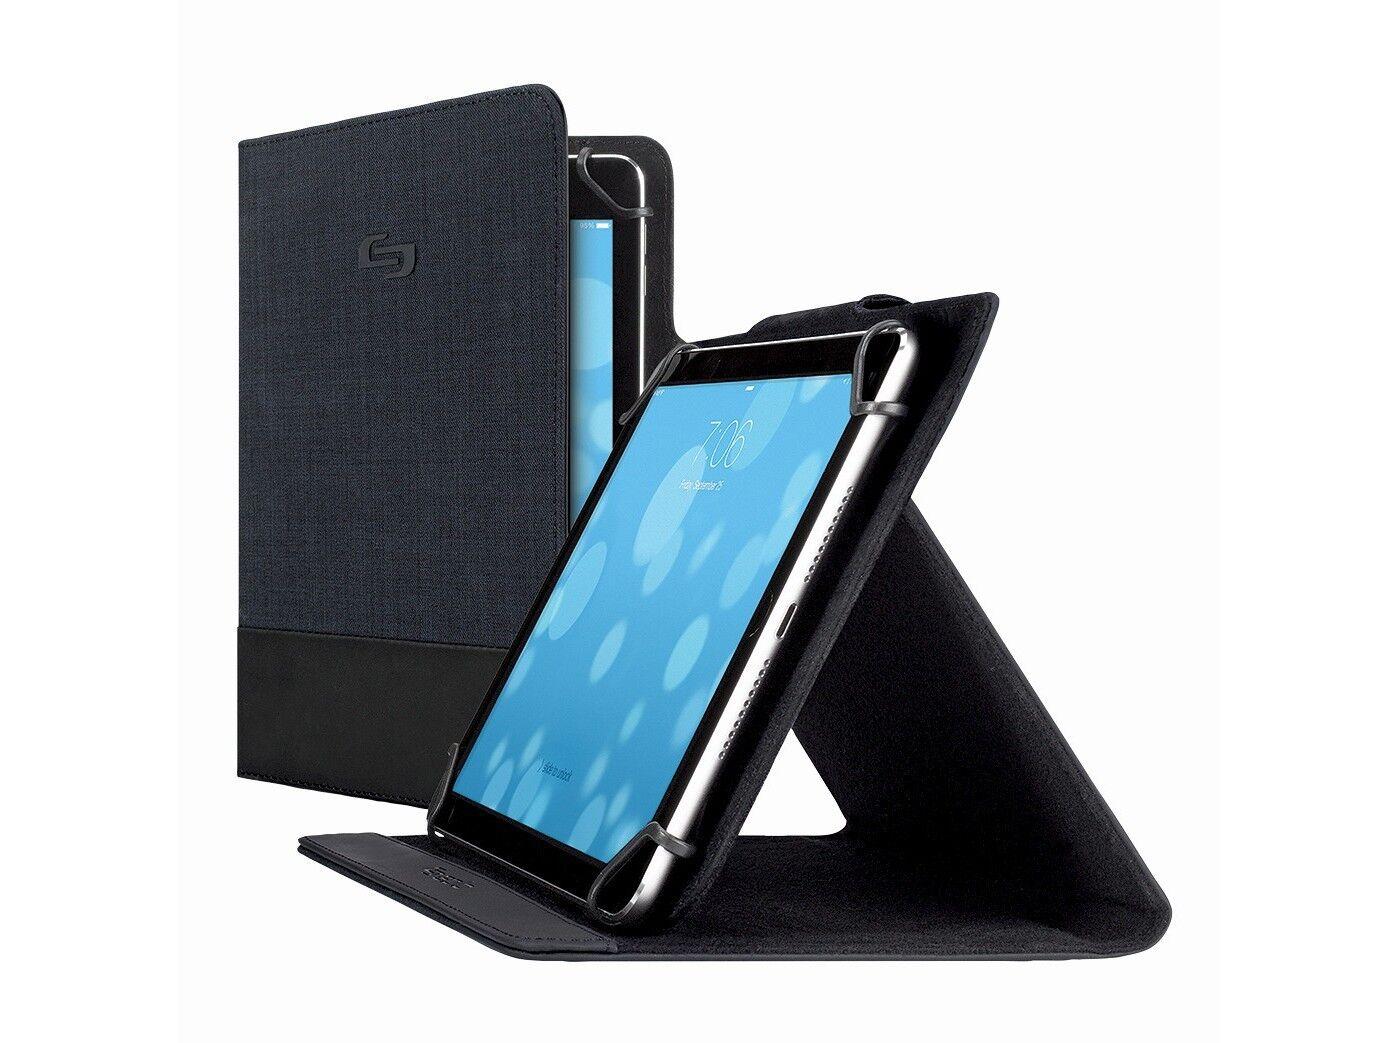 Solo Velocity Universal Tablet Case Black Fits IPad Mini/Sam